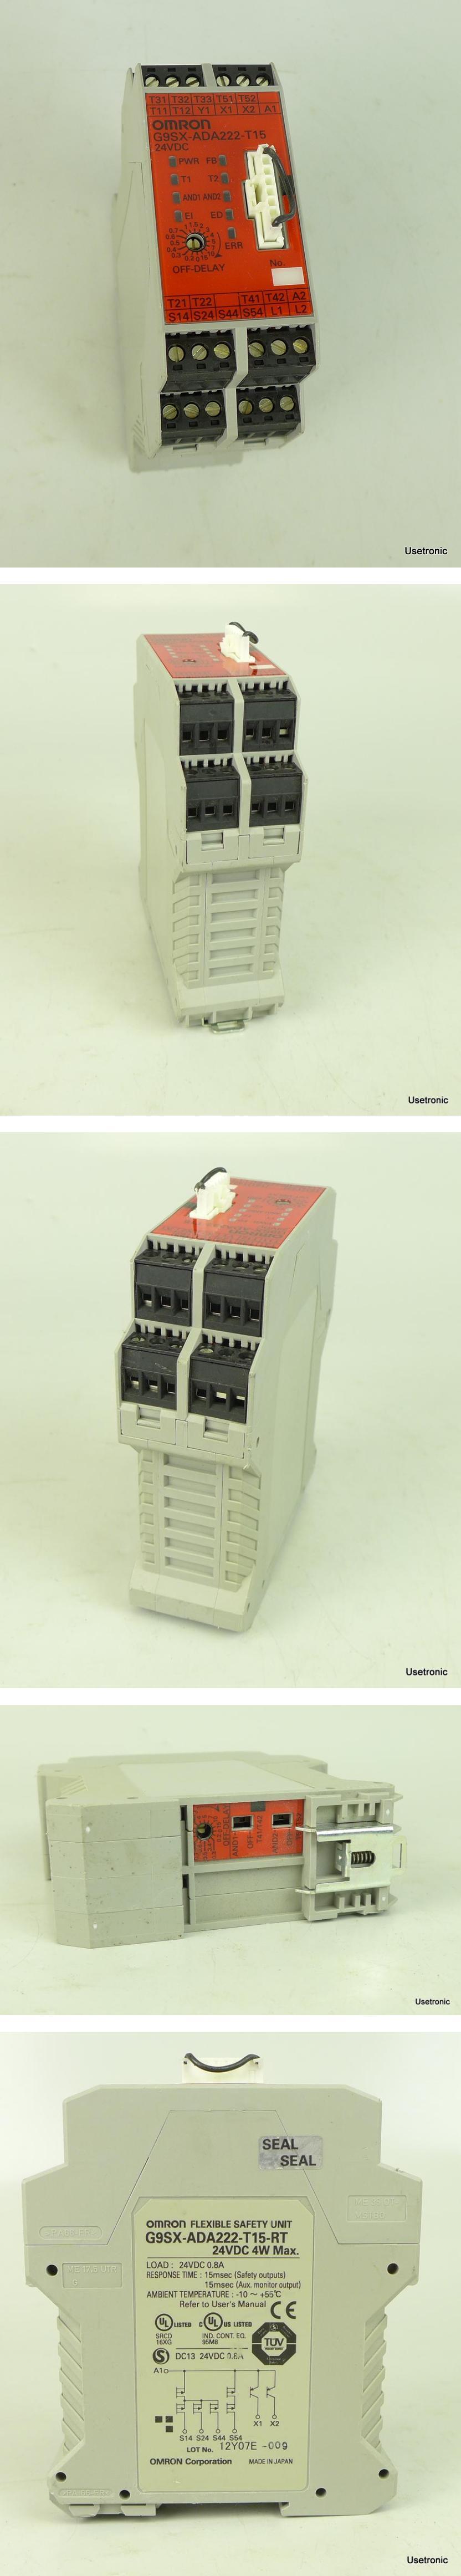 Omron G9SX-ADA222-T15